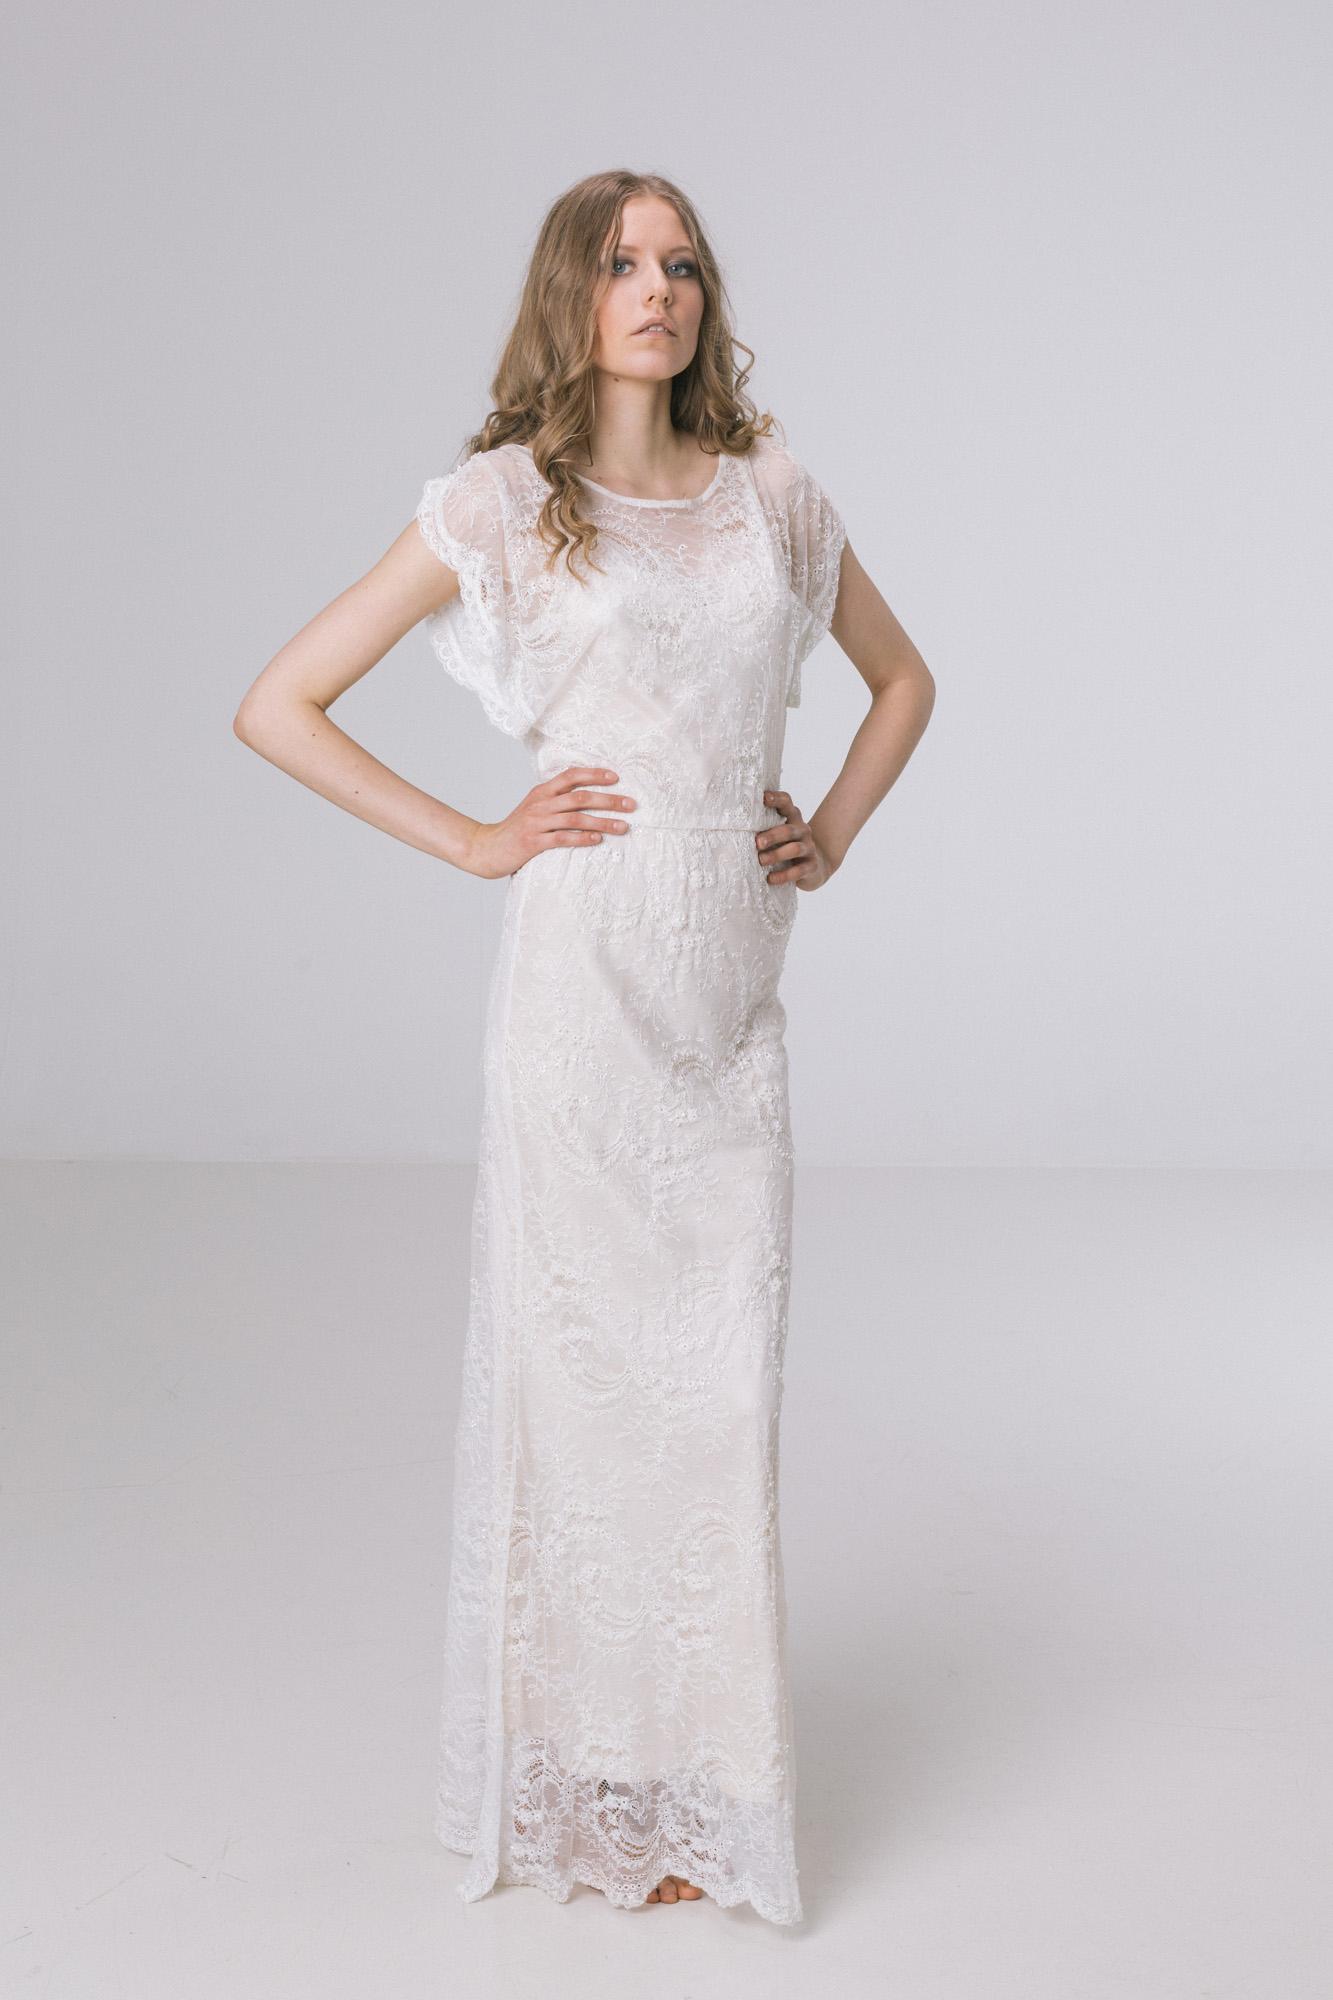 Indiebride London ethical wedding dresses - Ethical Wedding Dress Sample Sale with Indiebride London: 14th September 2019